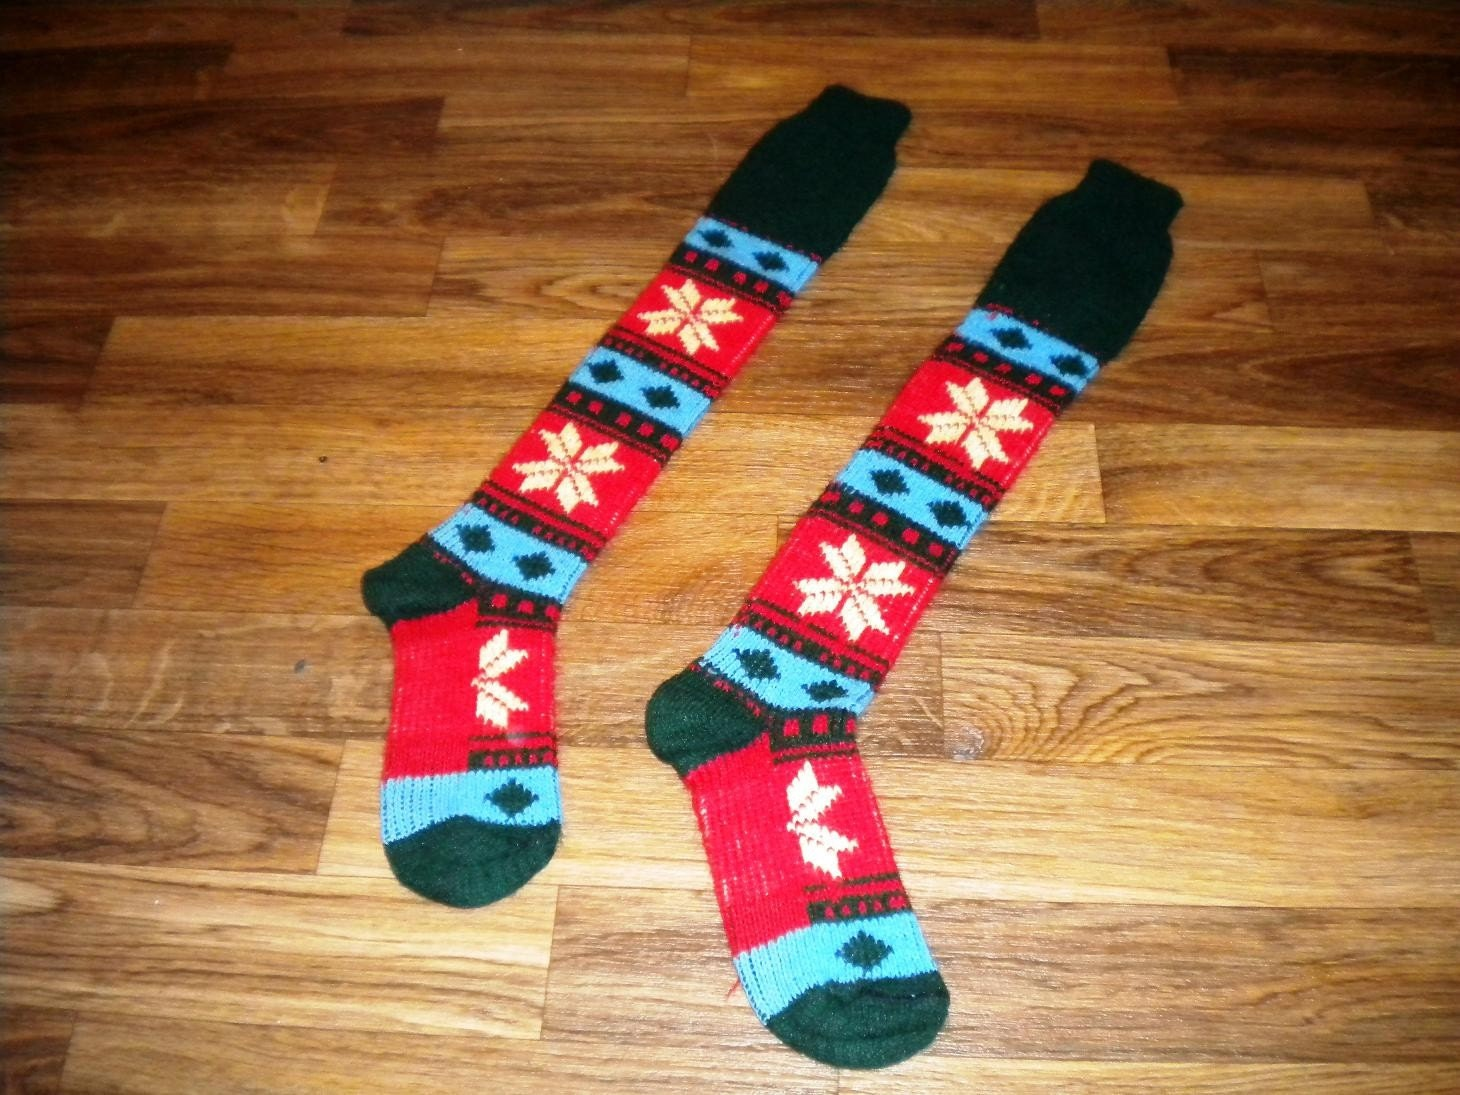 Small Fair Isle Knit Socks